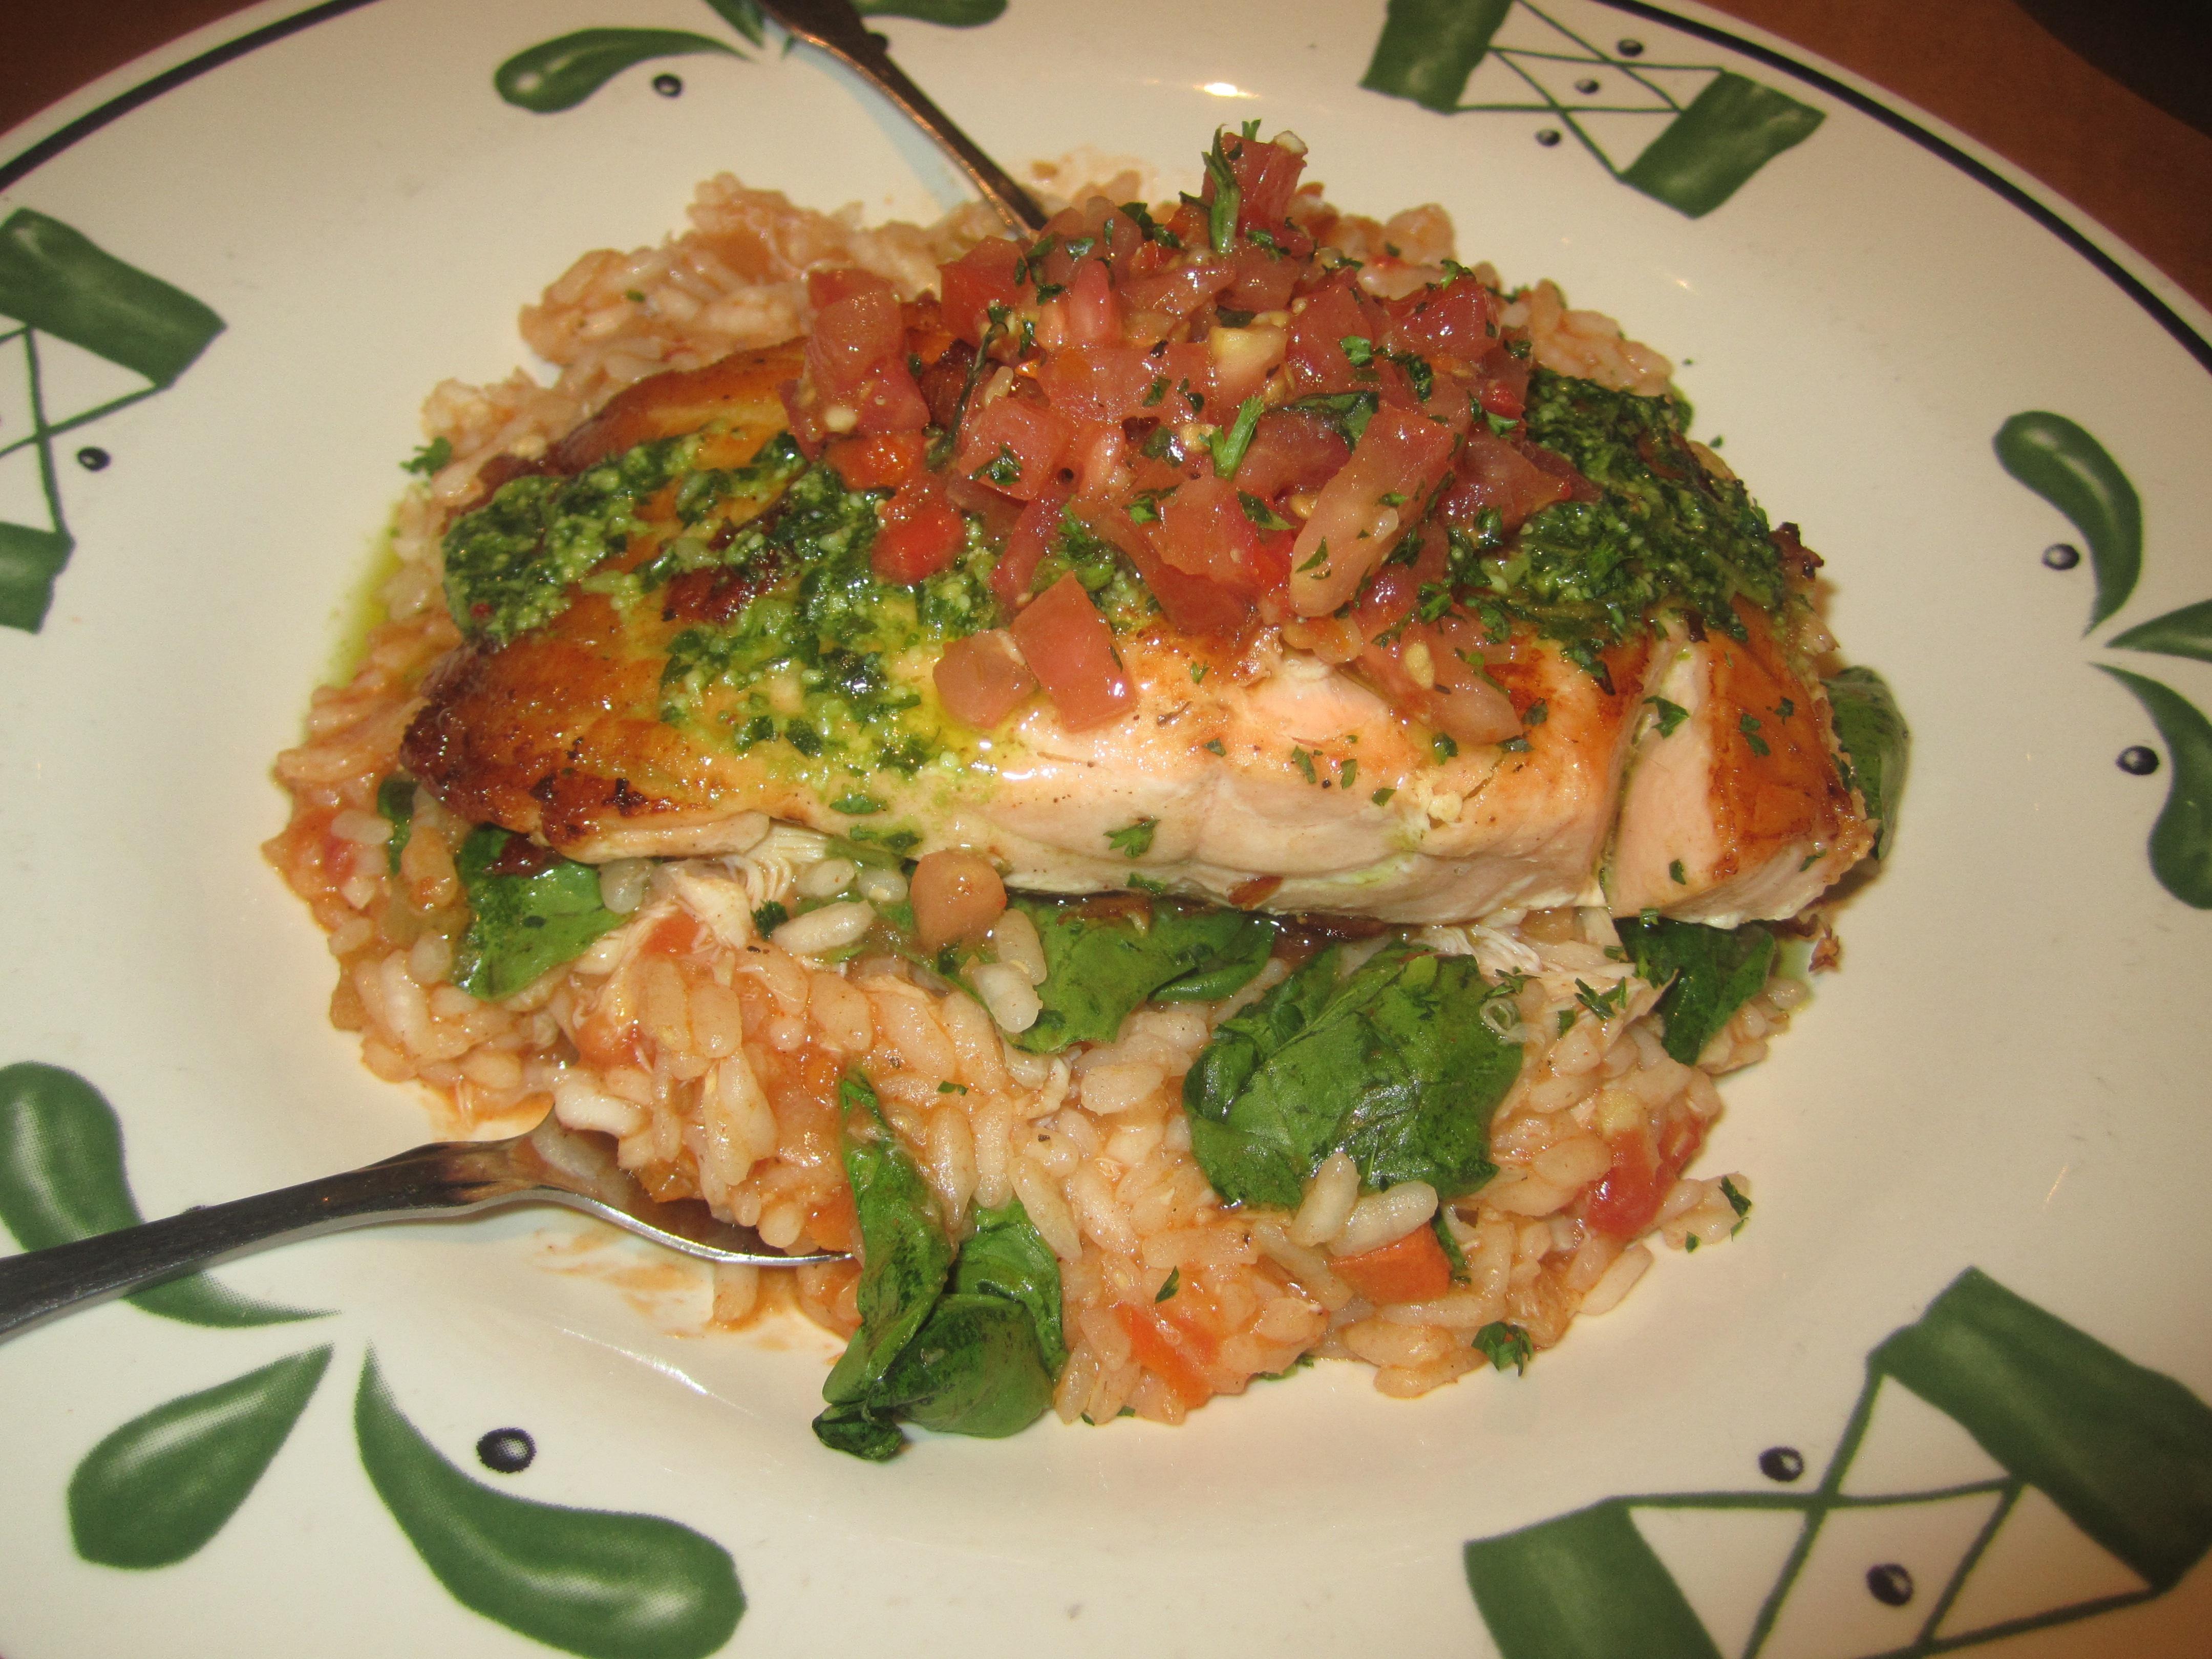 The Salmon Bruschetta. Photo By Karen